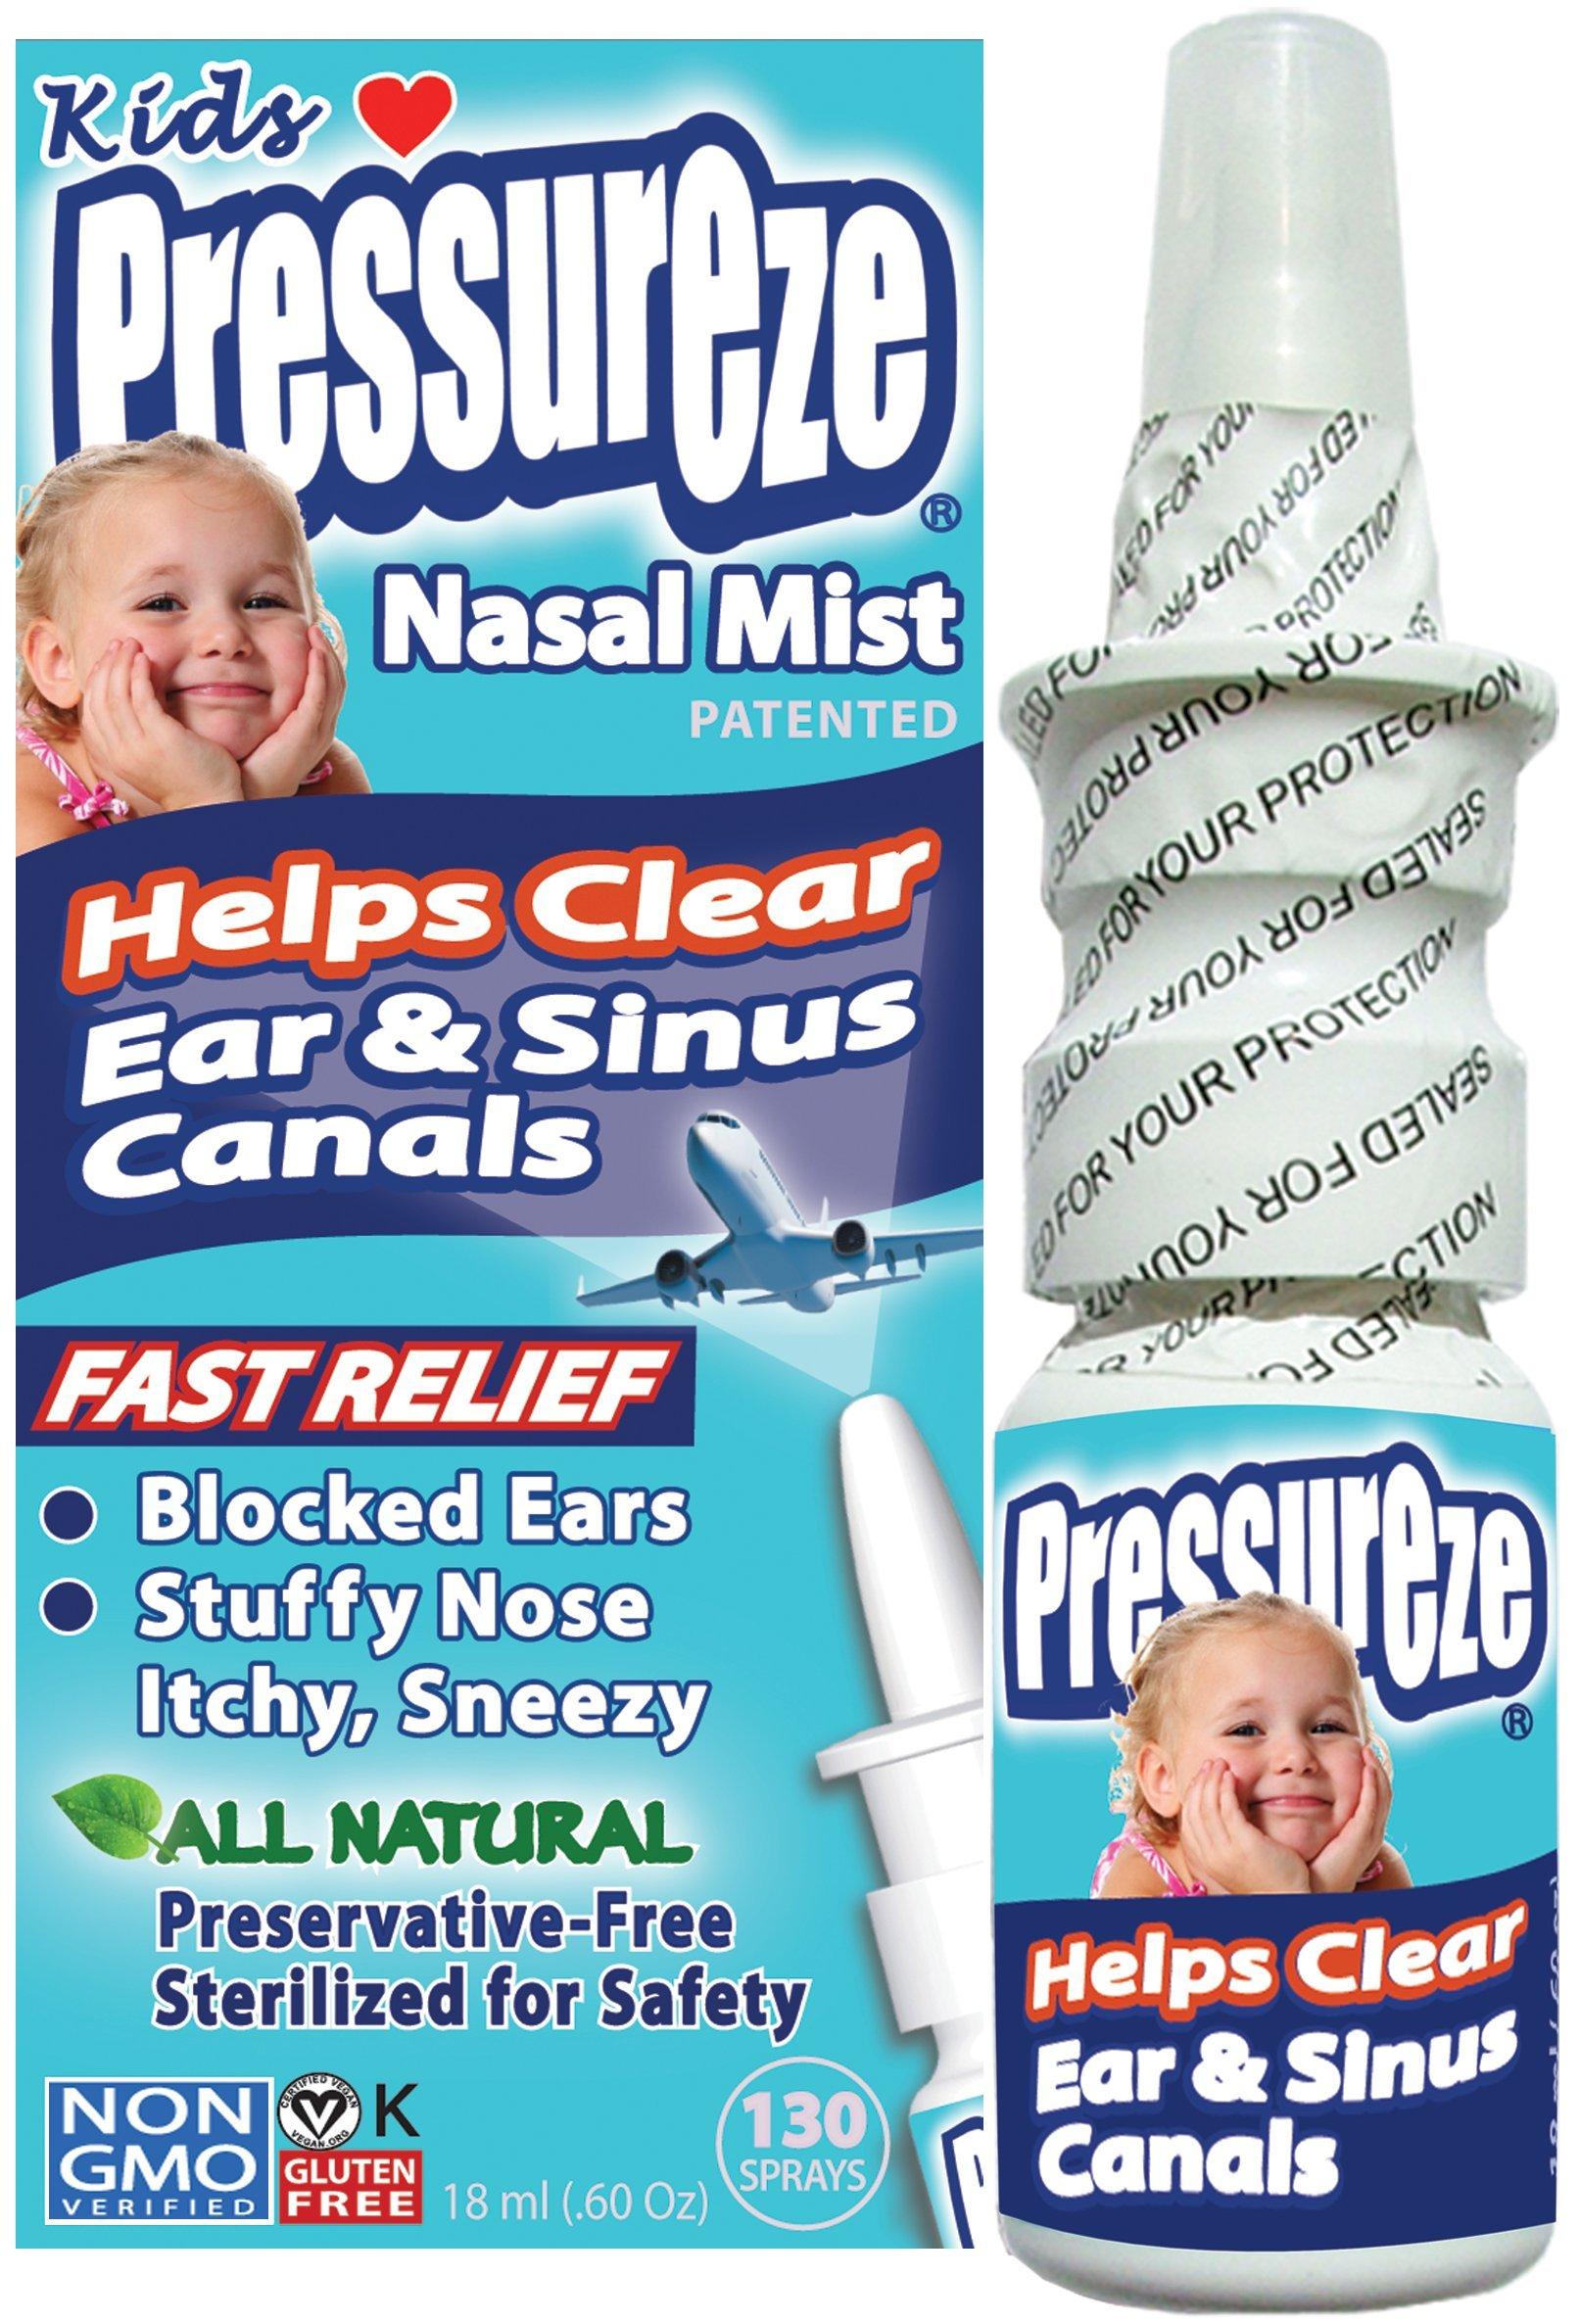 Pressureze Nasal Mist for Kids - 0.6 OZ - All Natural, Drug Free, Preservative Free, BPA Free, Sterile, Contamination Free, NON GMO, Vegan, Gluten Free